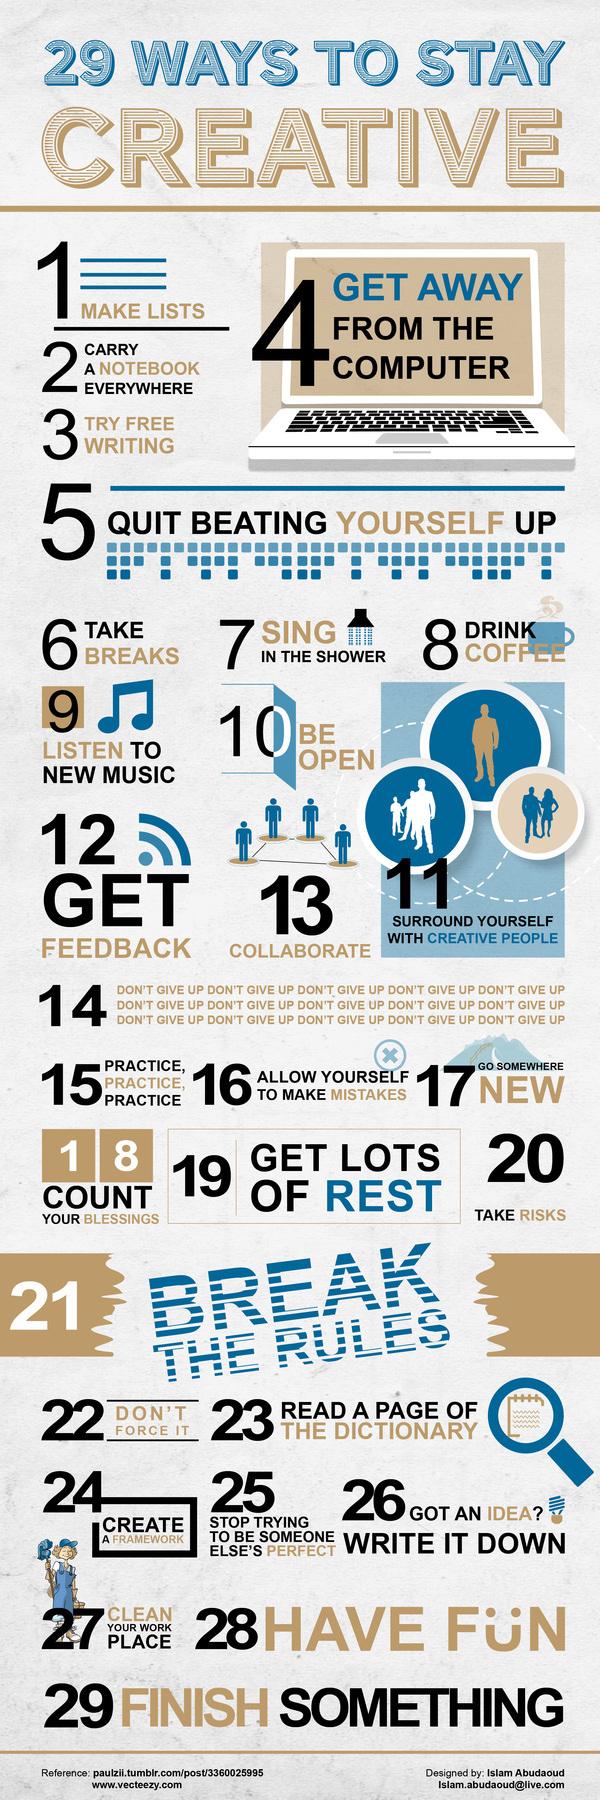 Kreativität, kreativ, Infografik, Tipps & Tricks